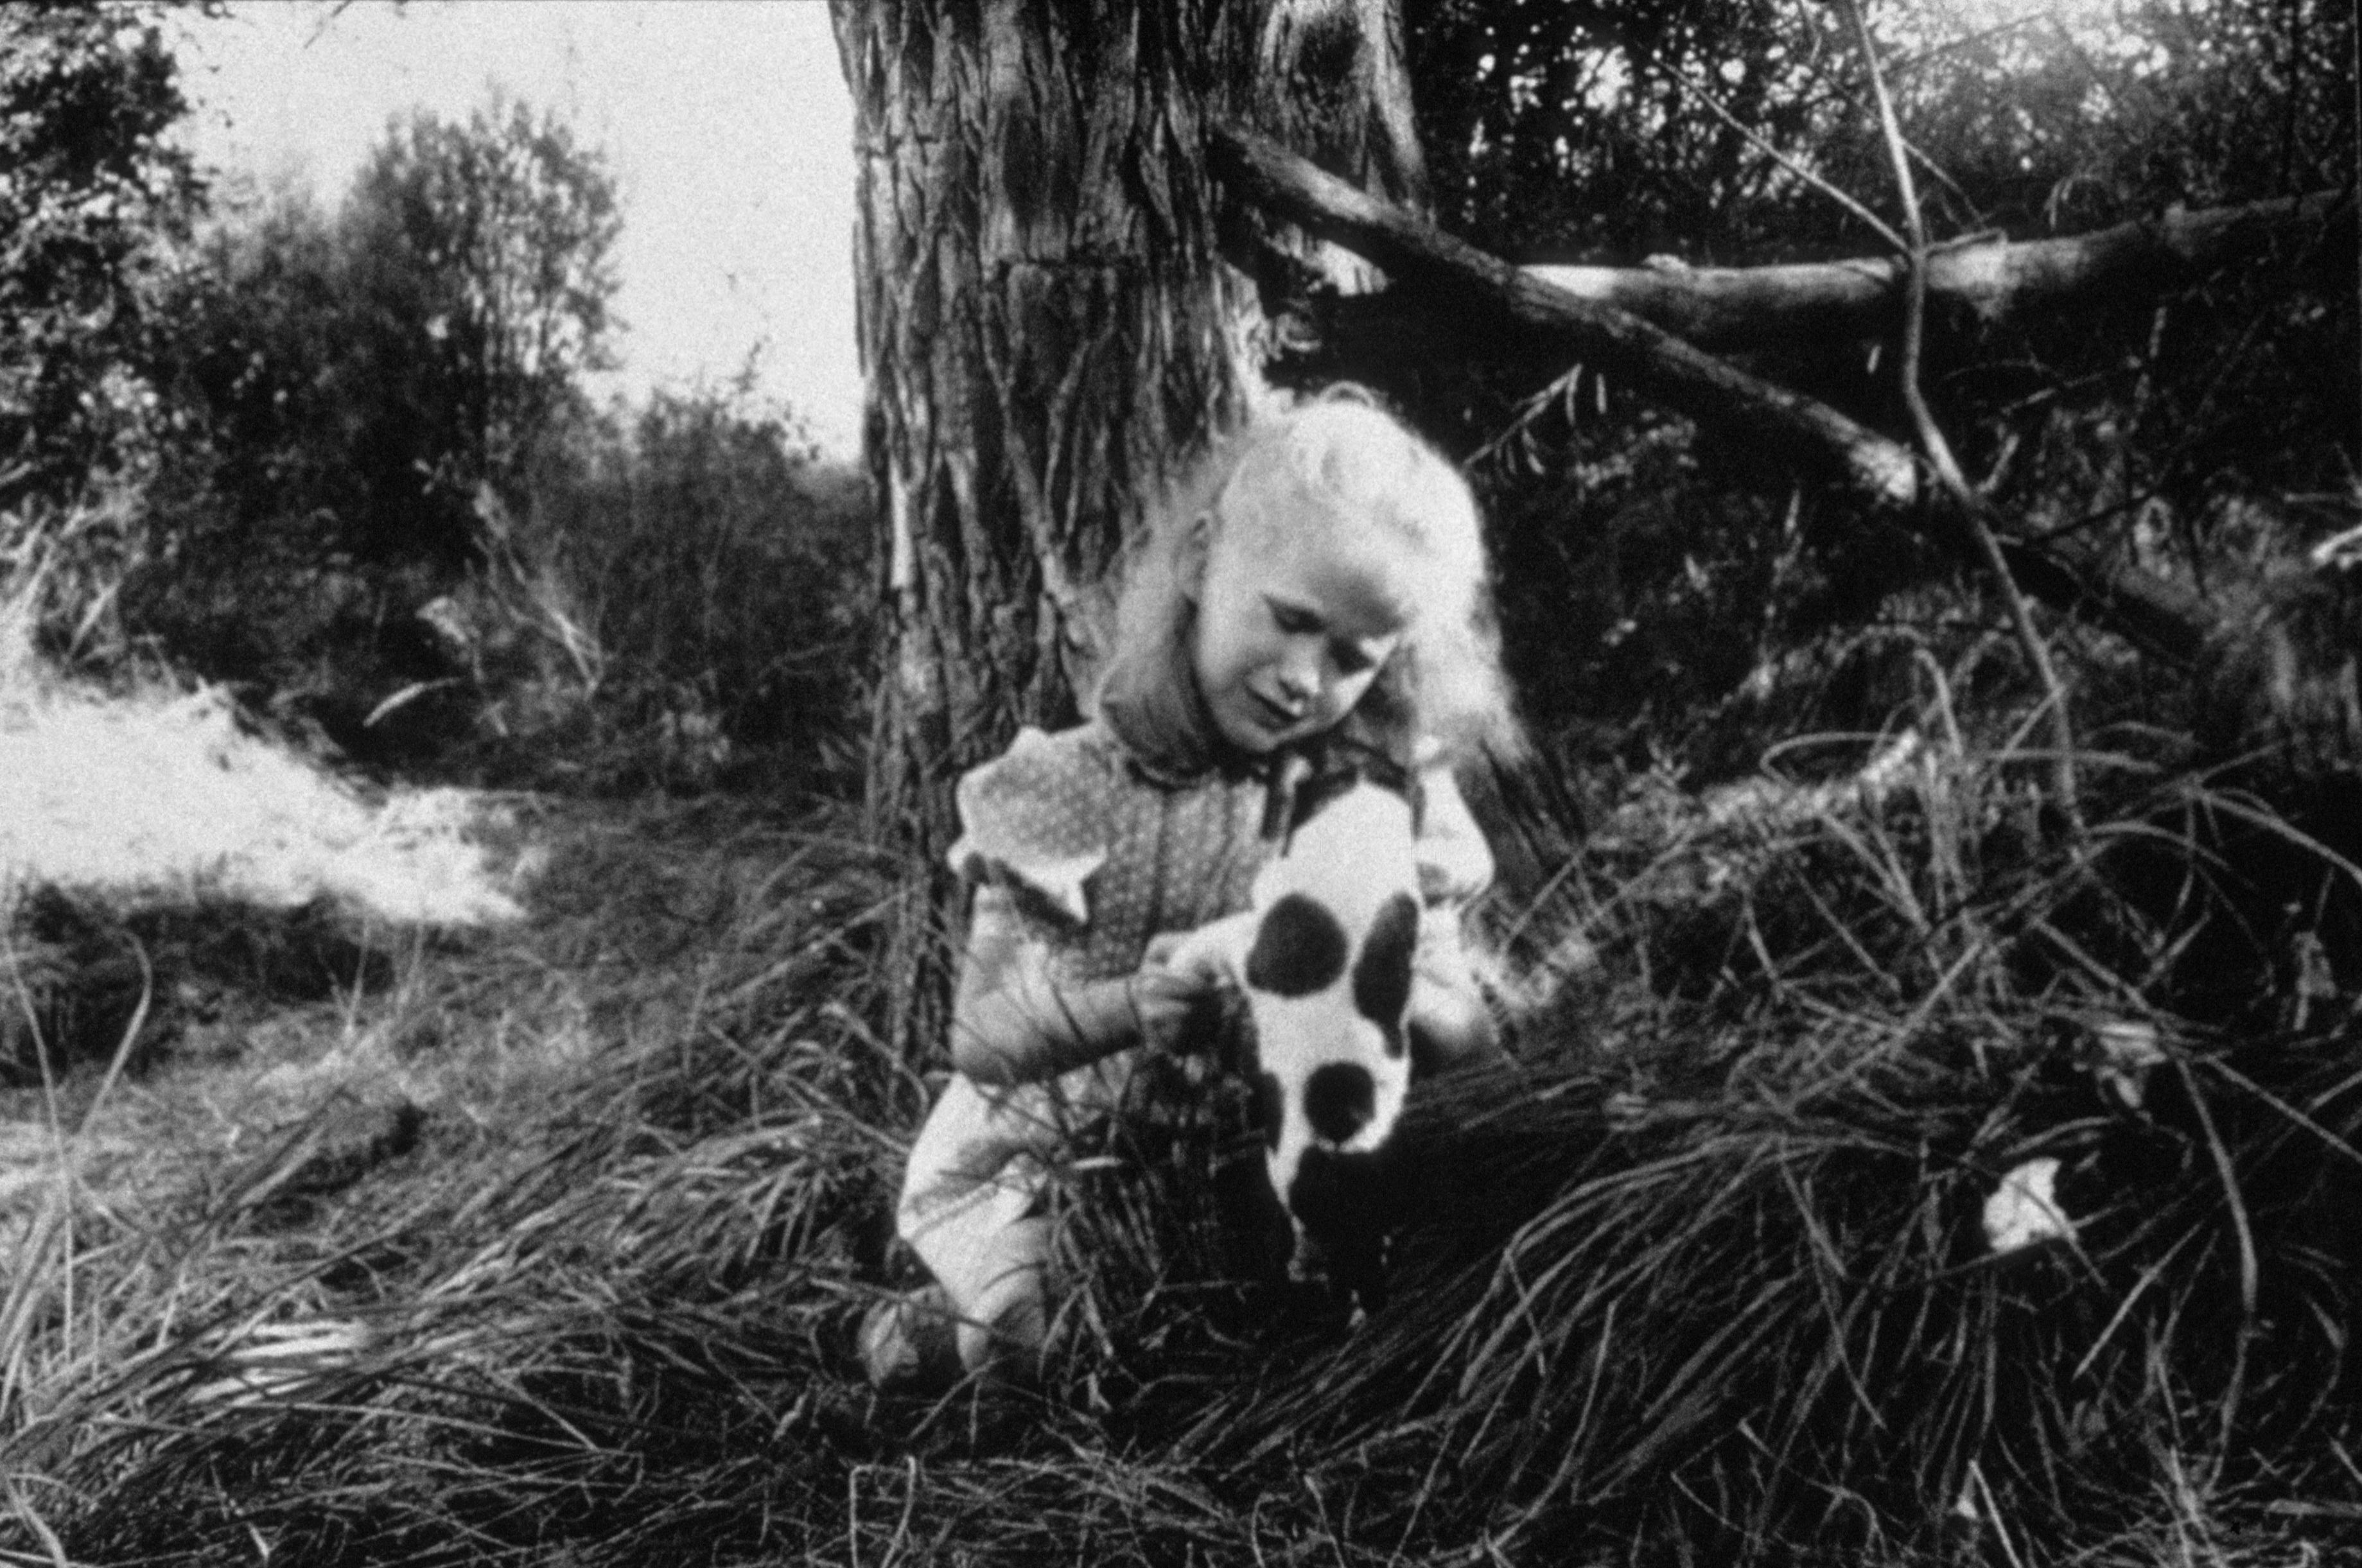 Brigitte Fossey In Rene Clements Forbidden Games 1952 Courtesy Rialto Pictures